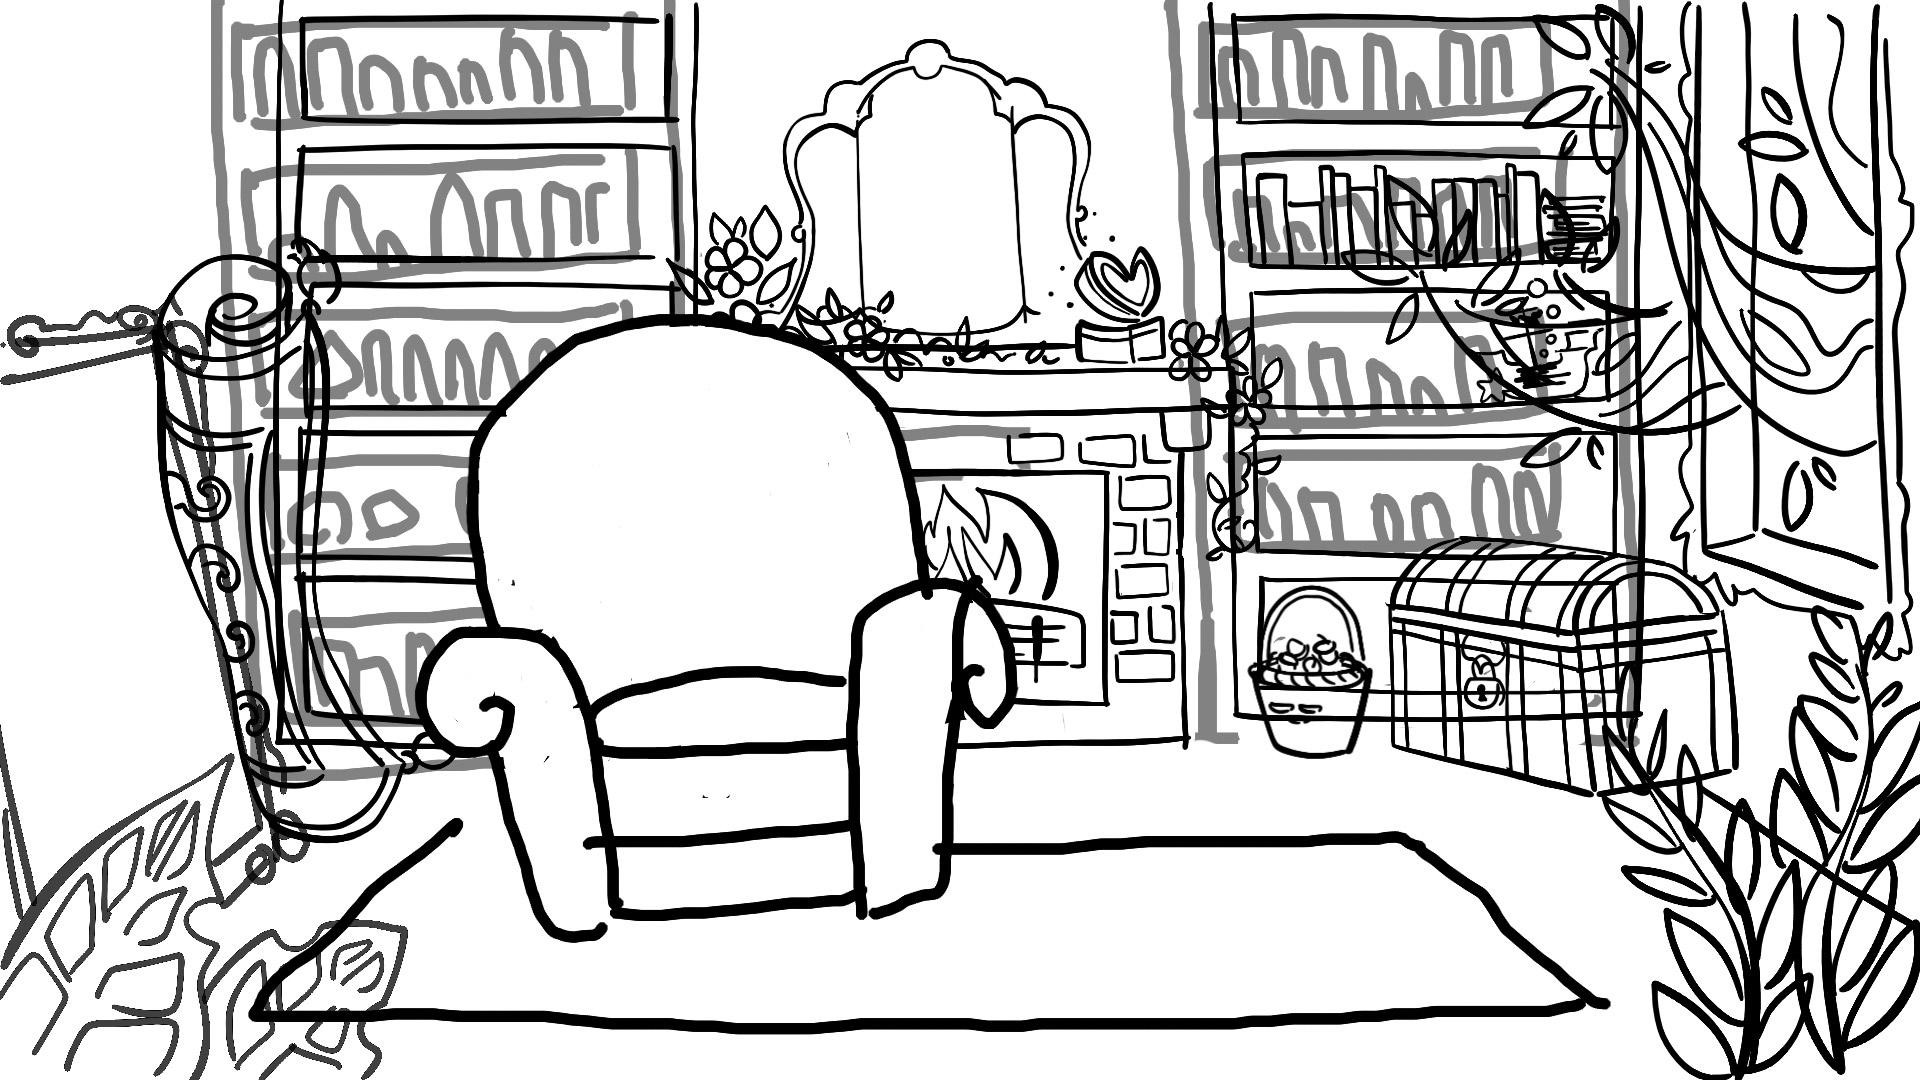 Disney-BoOUaT-Storyroom_Sketch.jpg